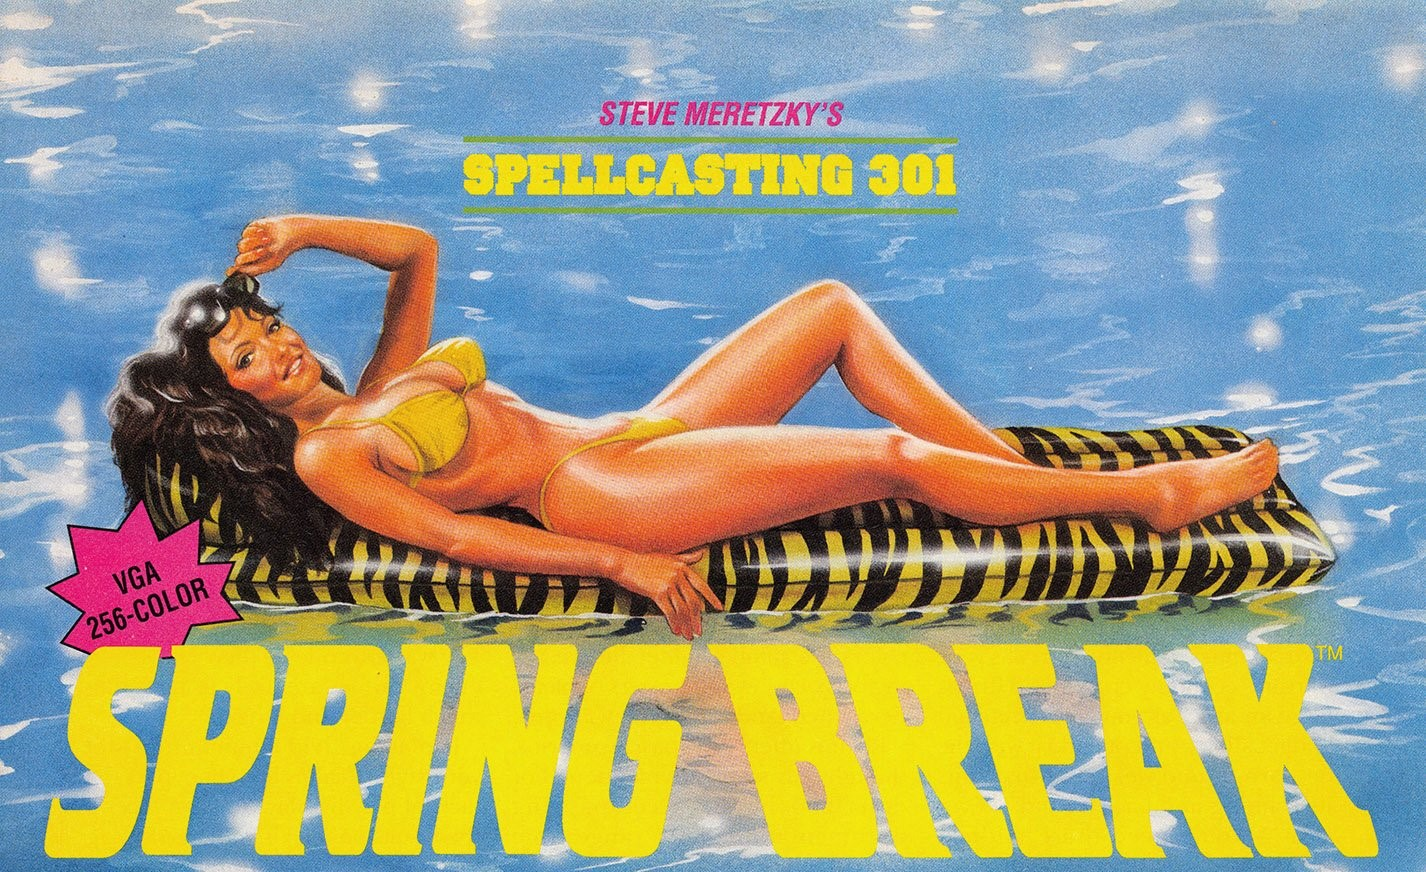 Spellcasting 301 Spring Break adventure dos game 1992